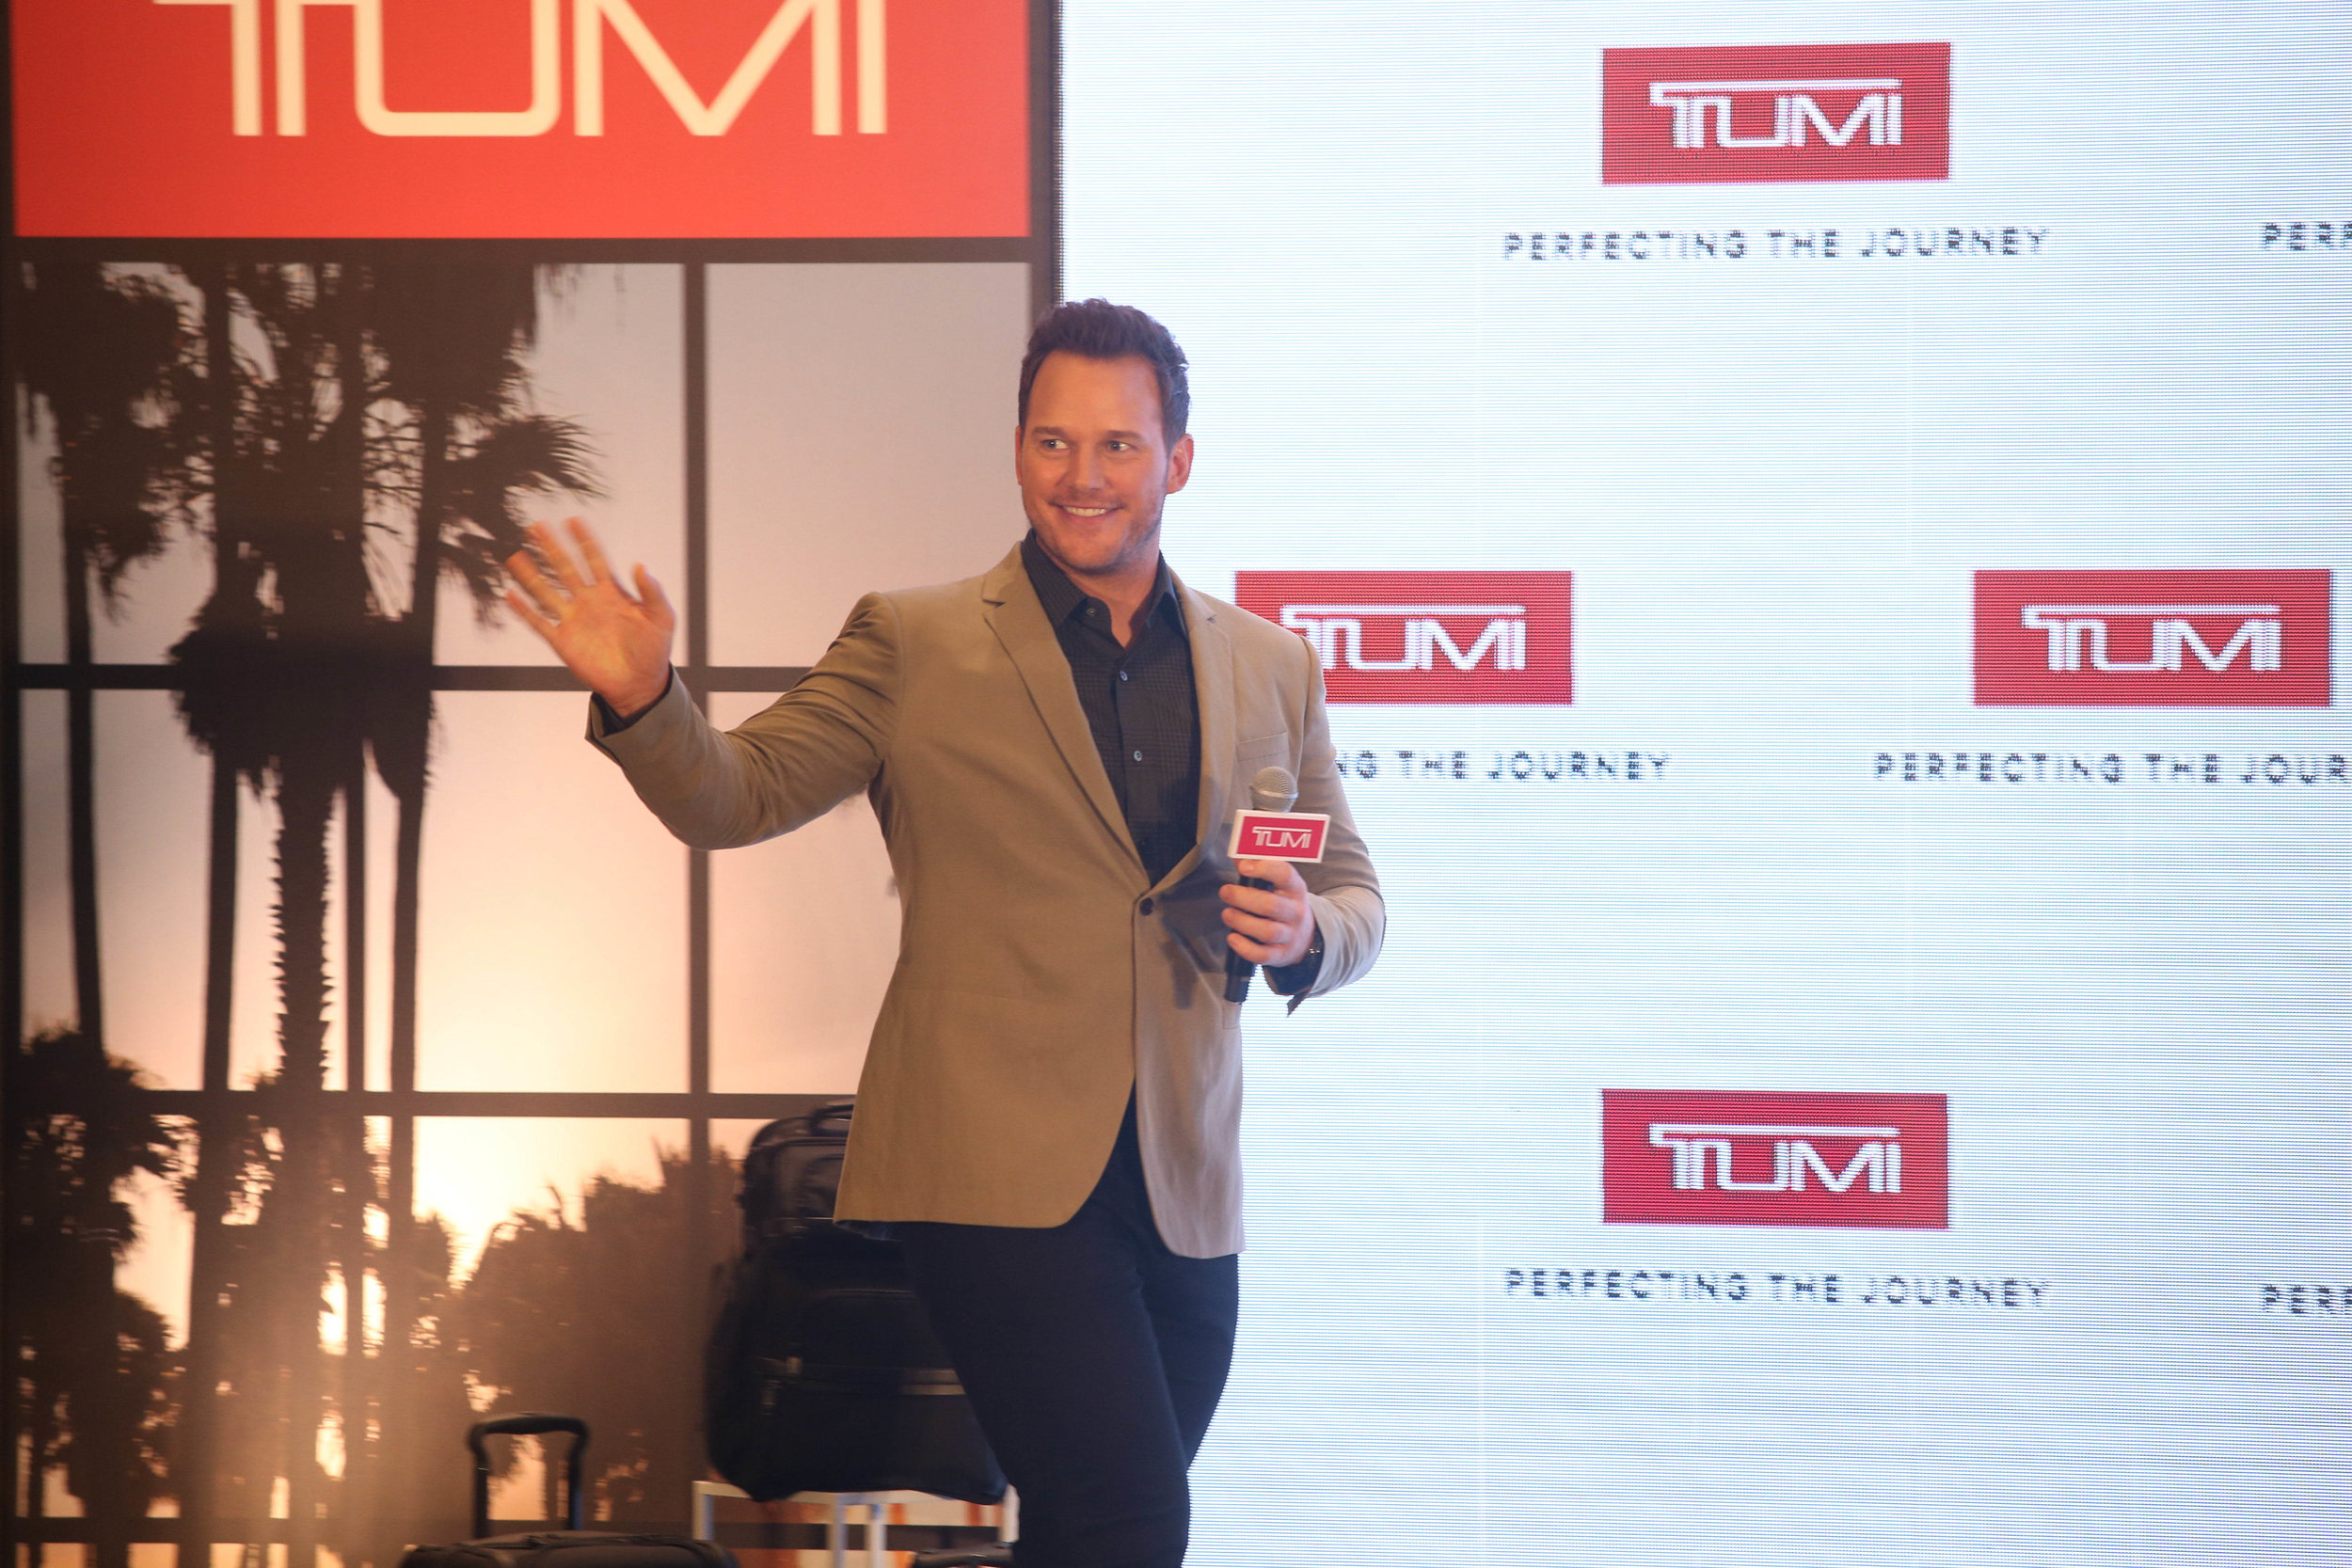 TUMI x CHRIS PRATT Launch at TUMI Loft -